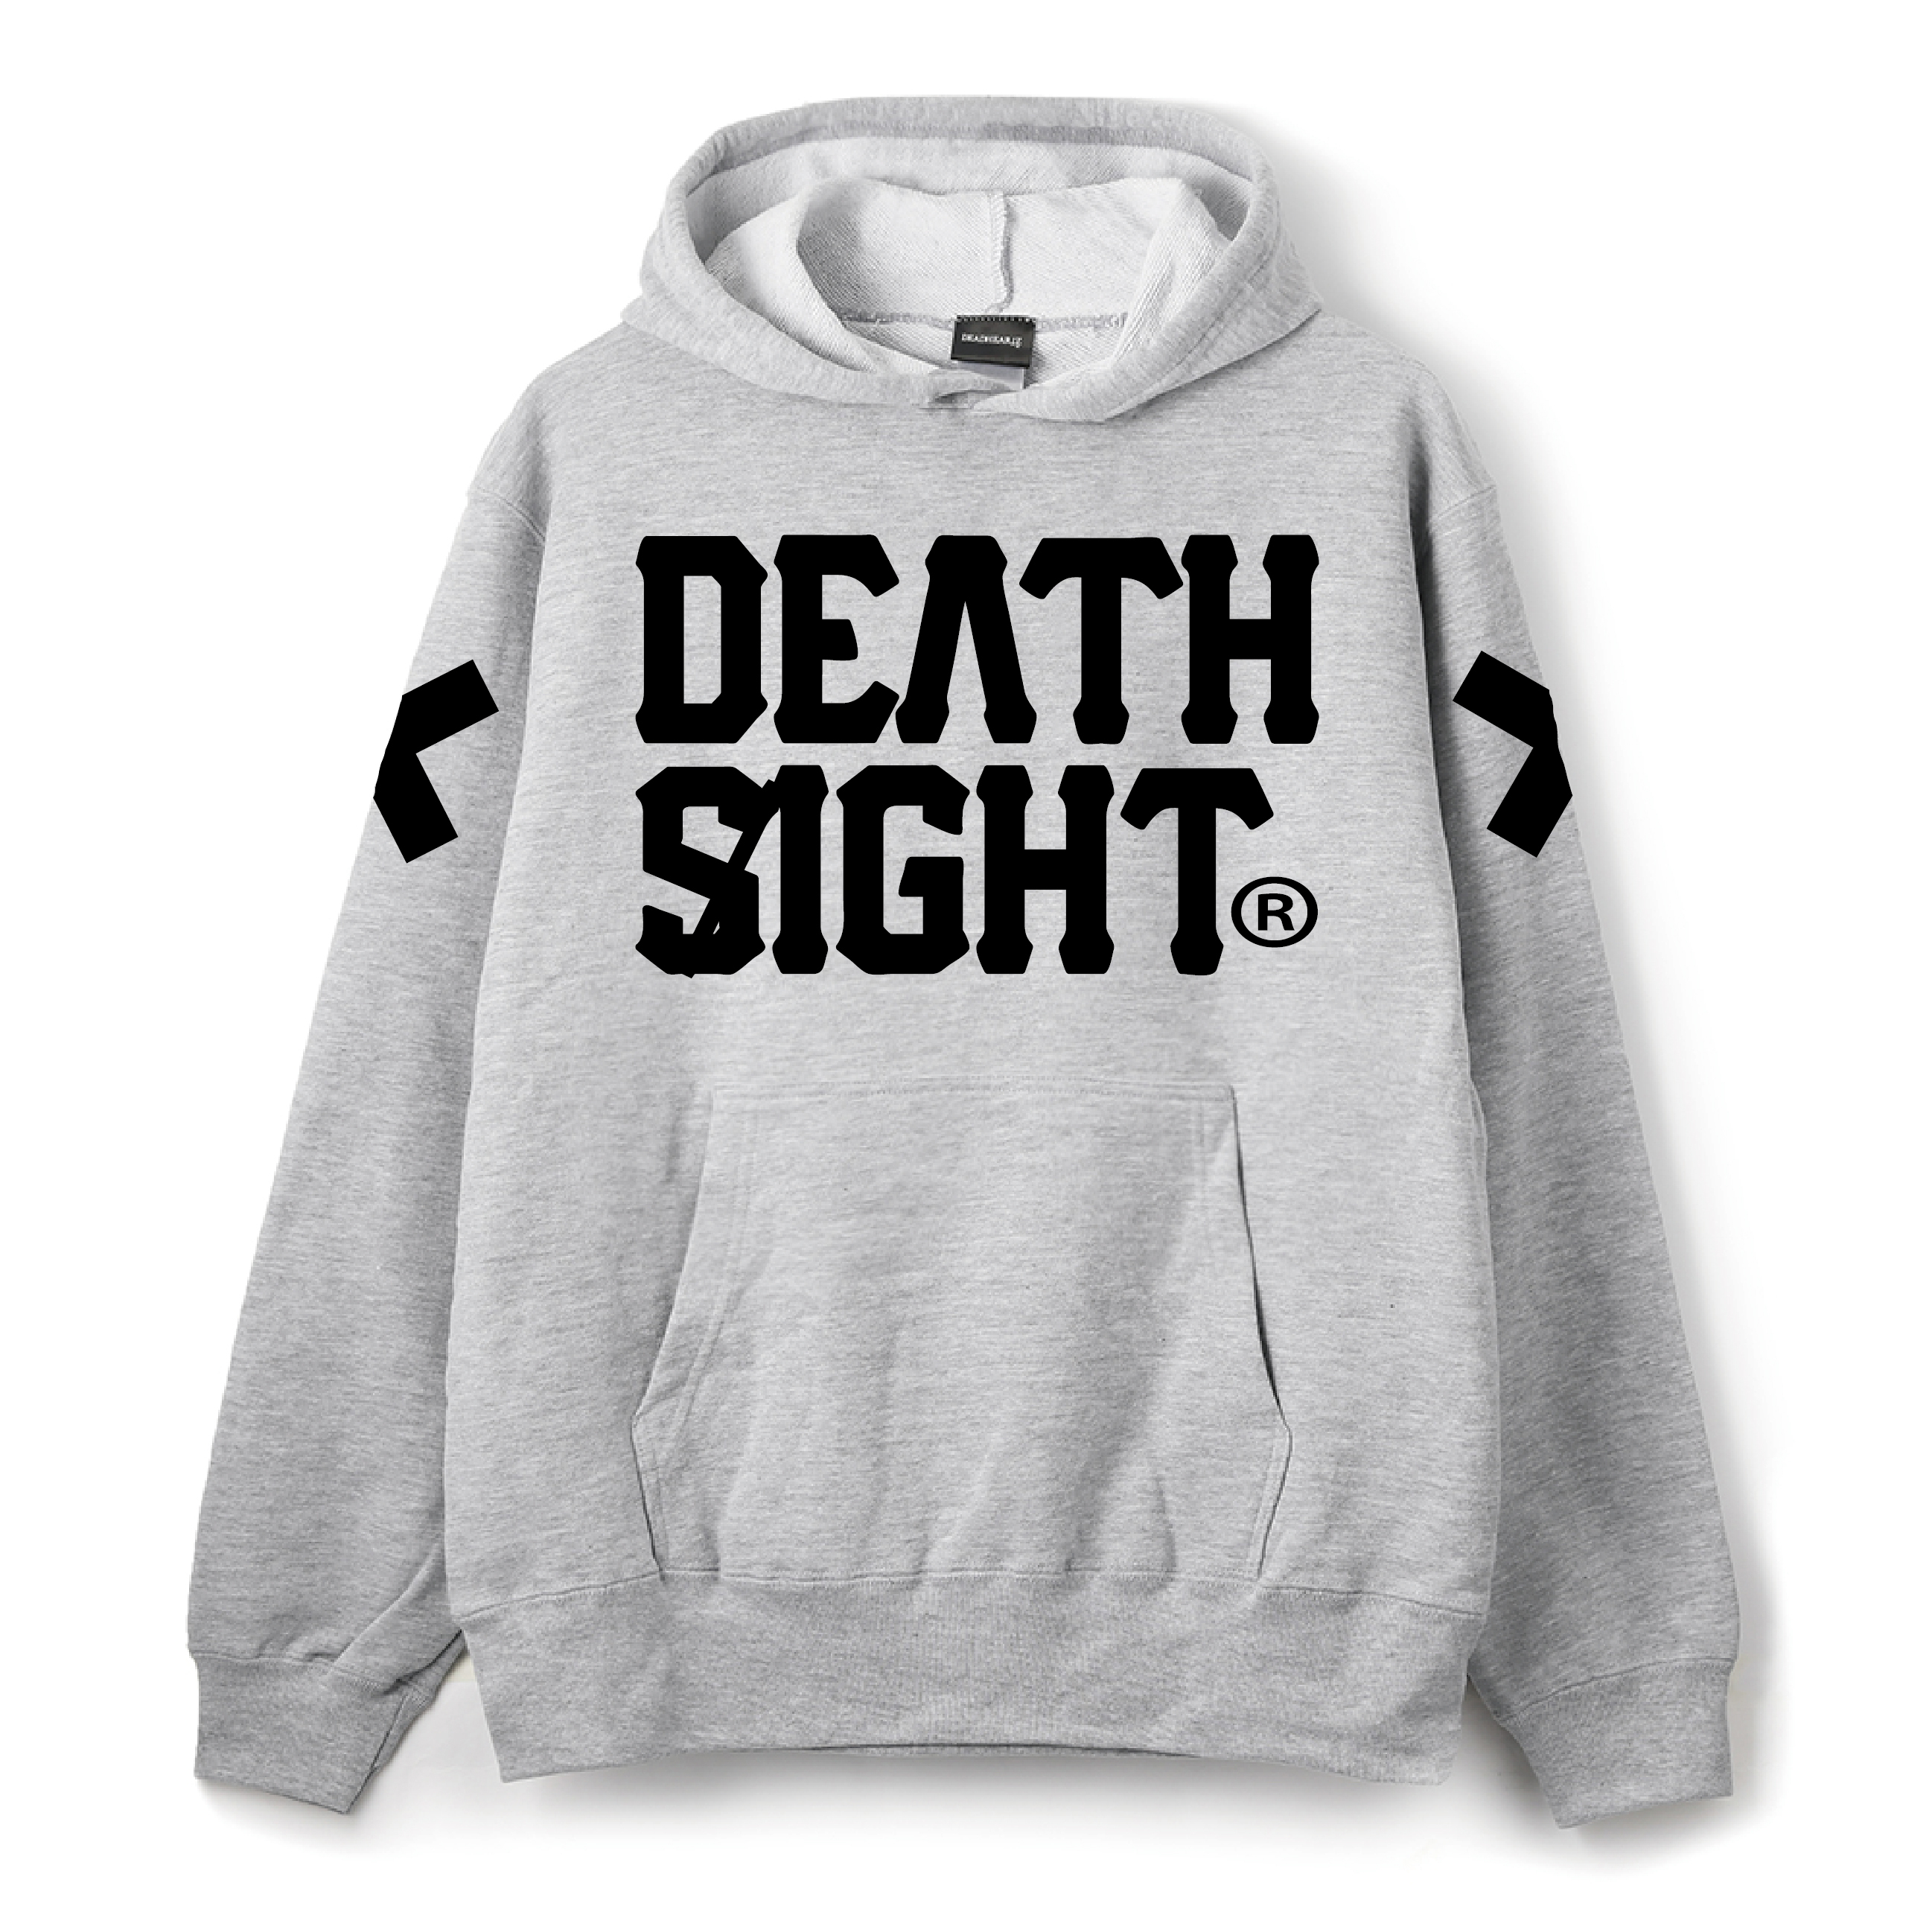 deathsight 17 Hoodie / GRAY - 画像1